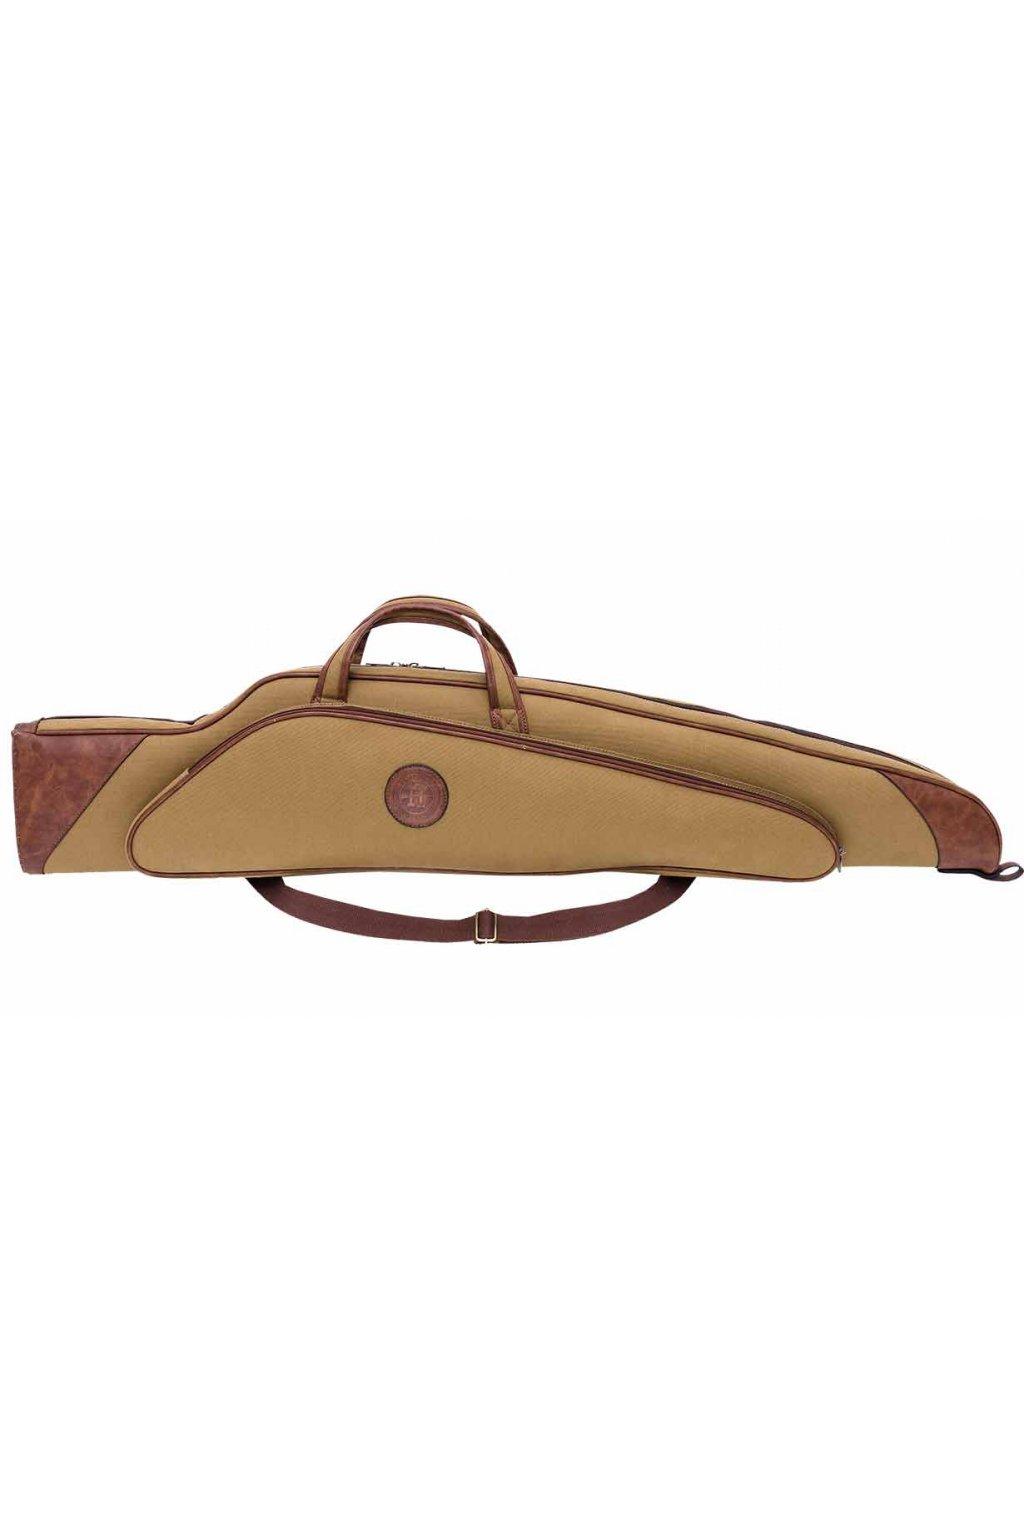 AKAH - HATARI  pouzdro na zbraň (látka-kůže)